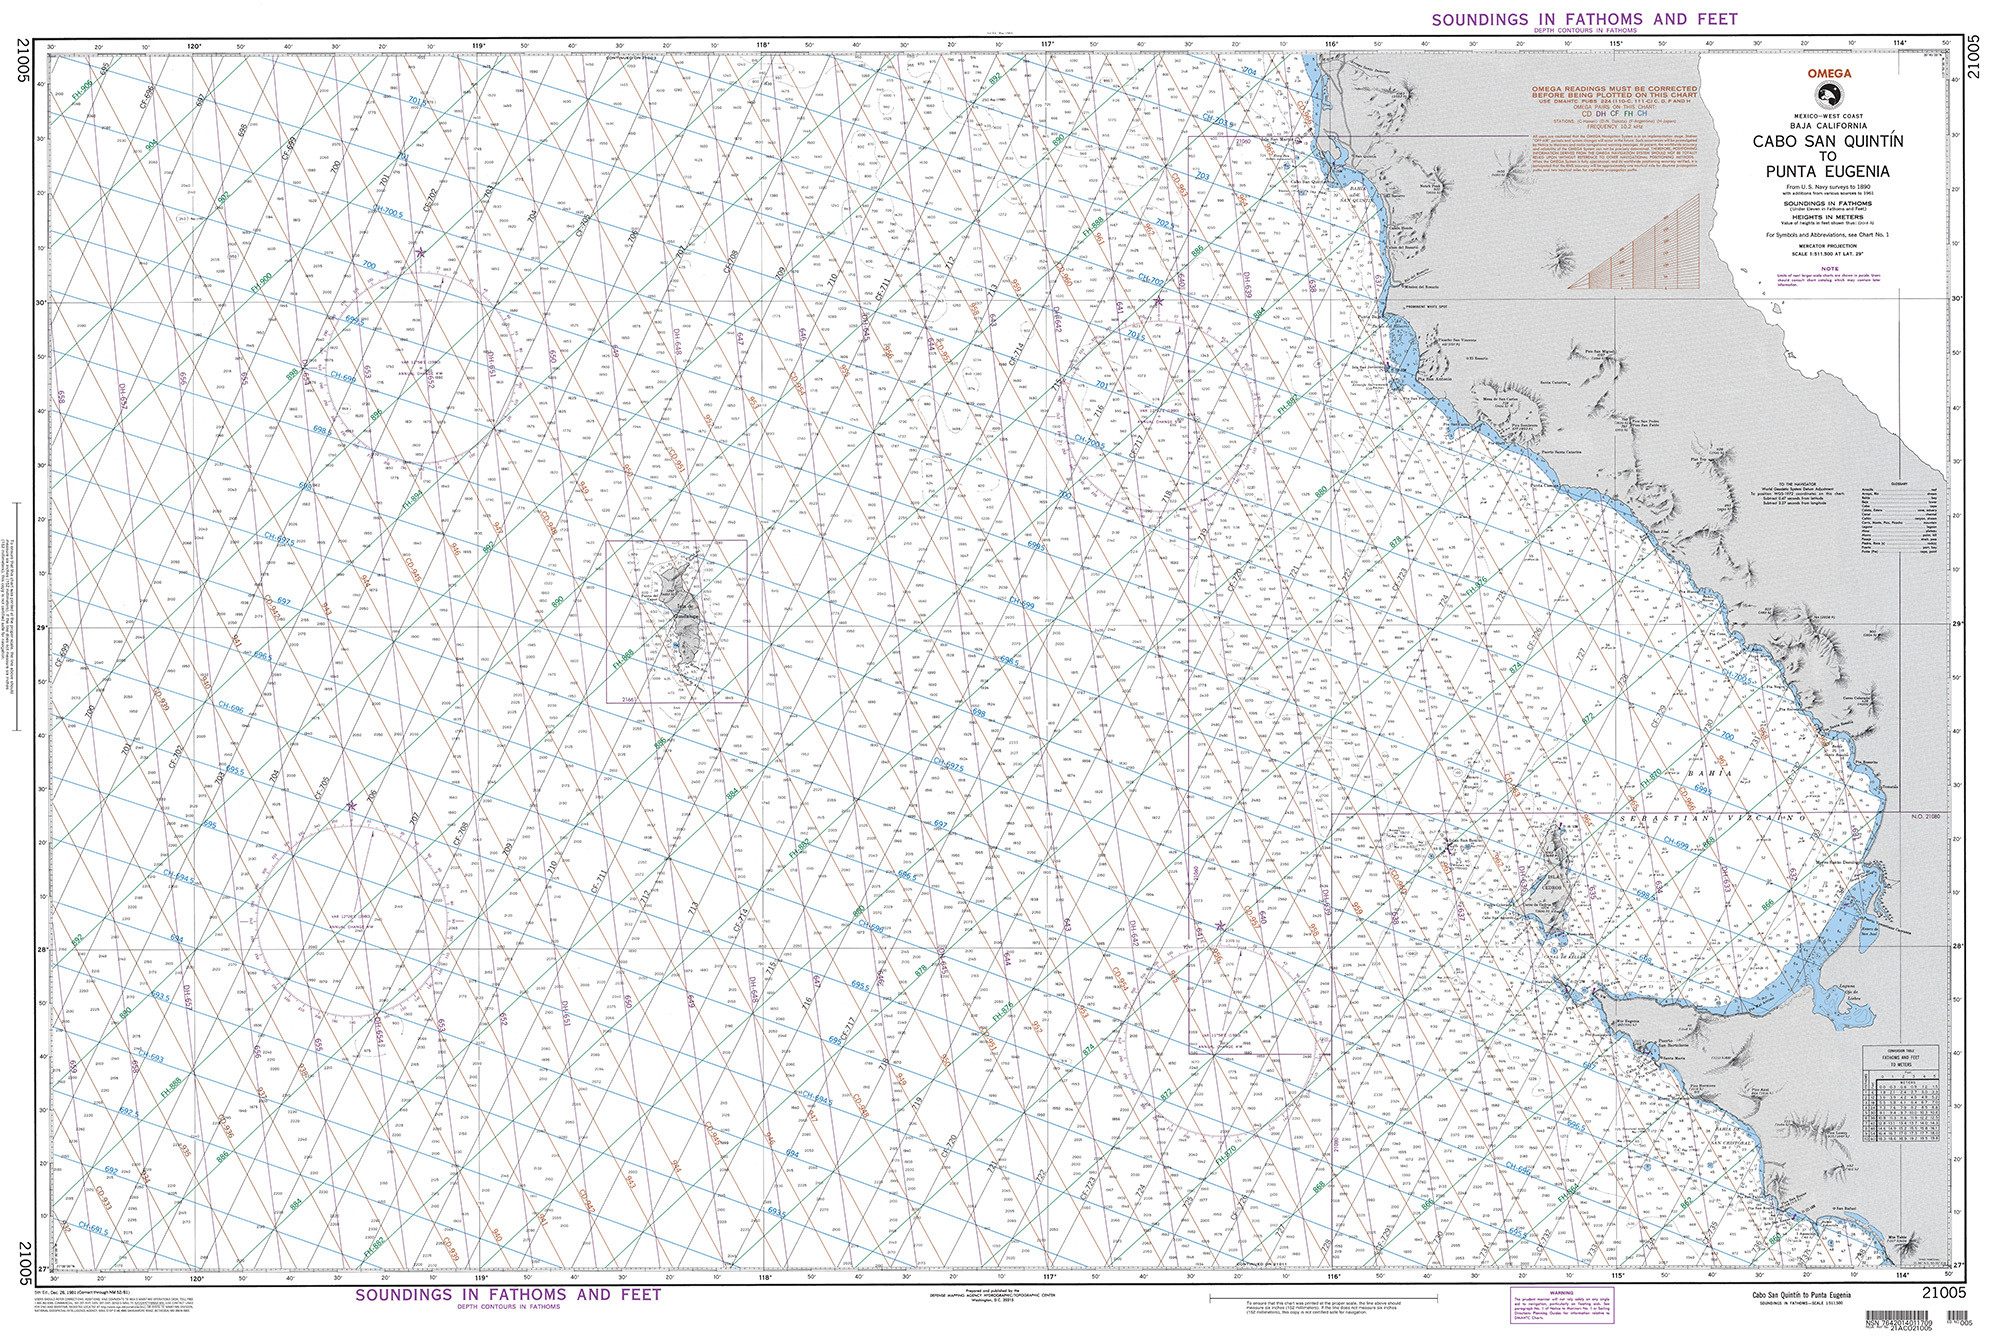 NGA Nautical Chart - 21005 Cabo San Quintin to Punta Eugenia (Mexico-West  Coast) (OMEGA)